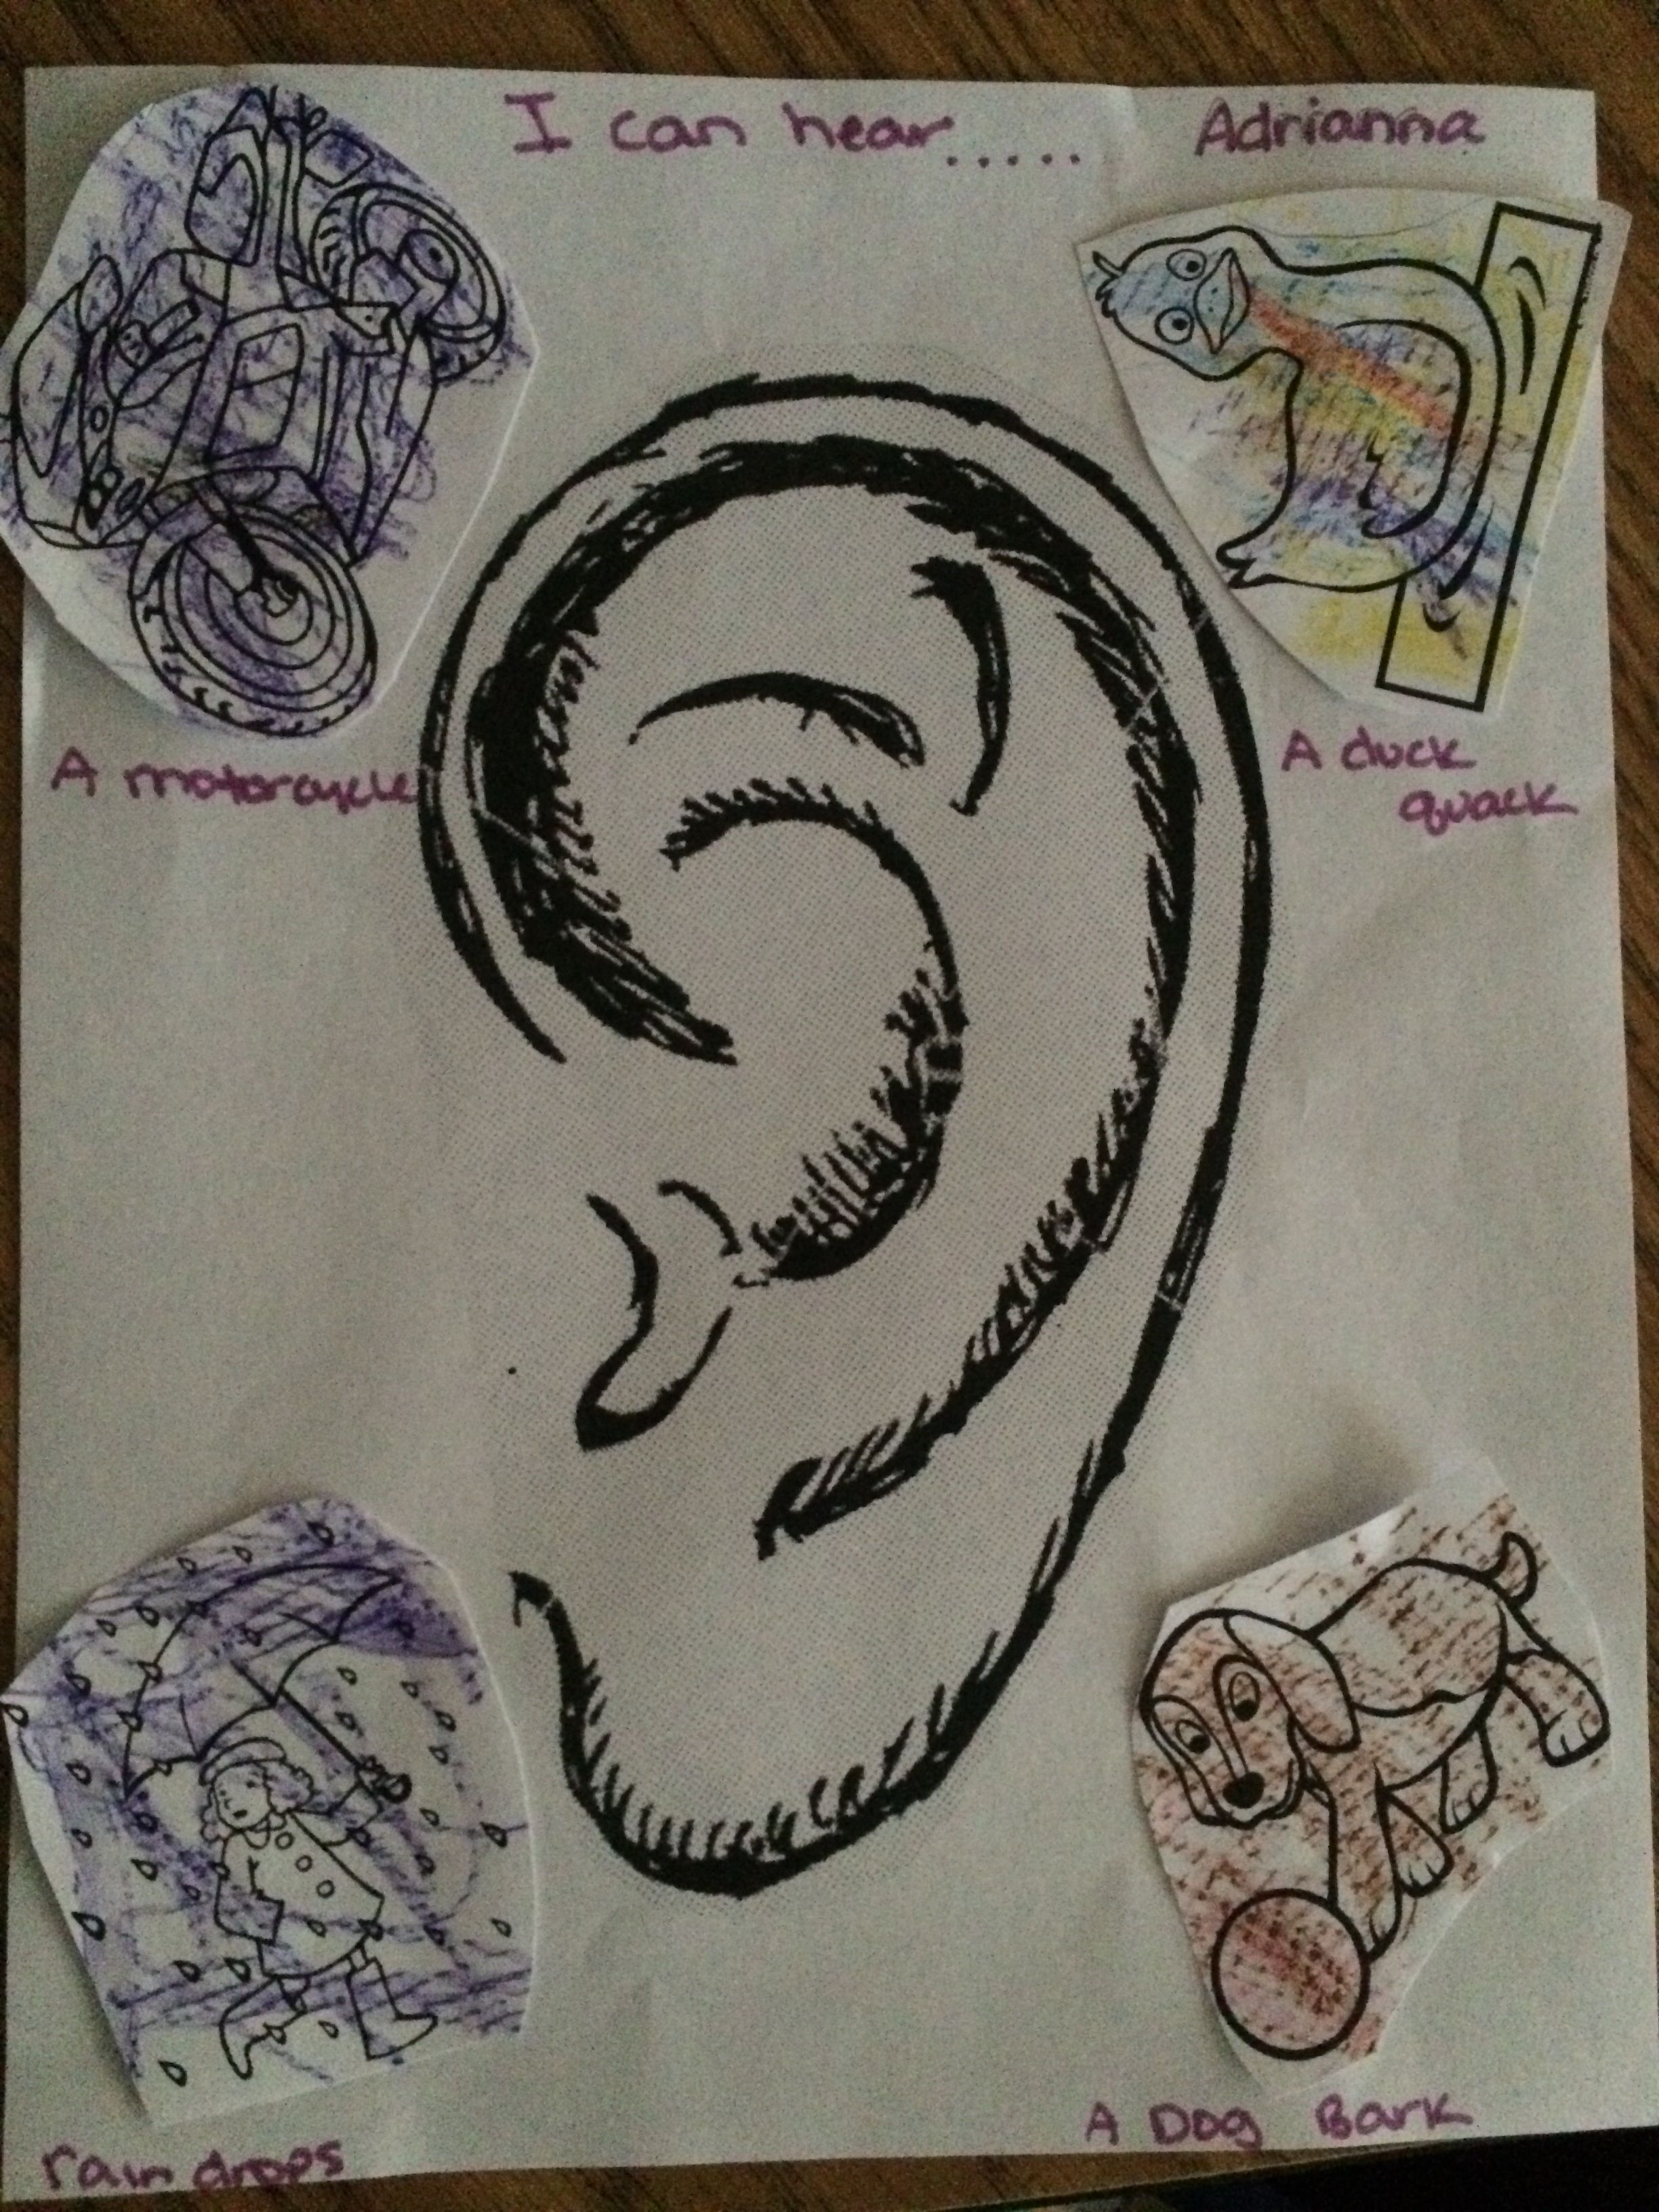 5 Senses Hearing